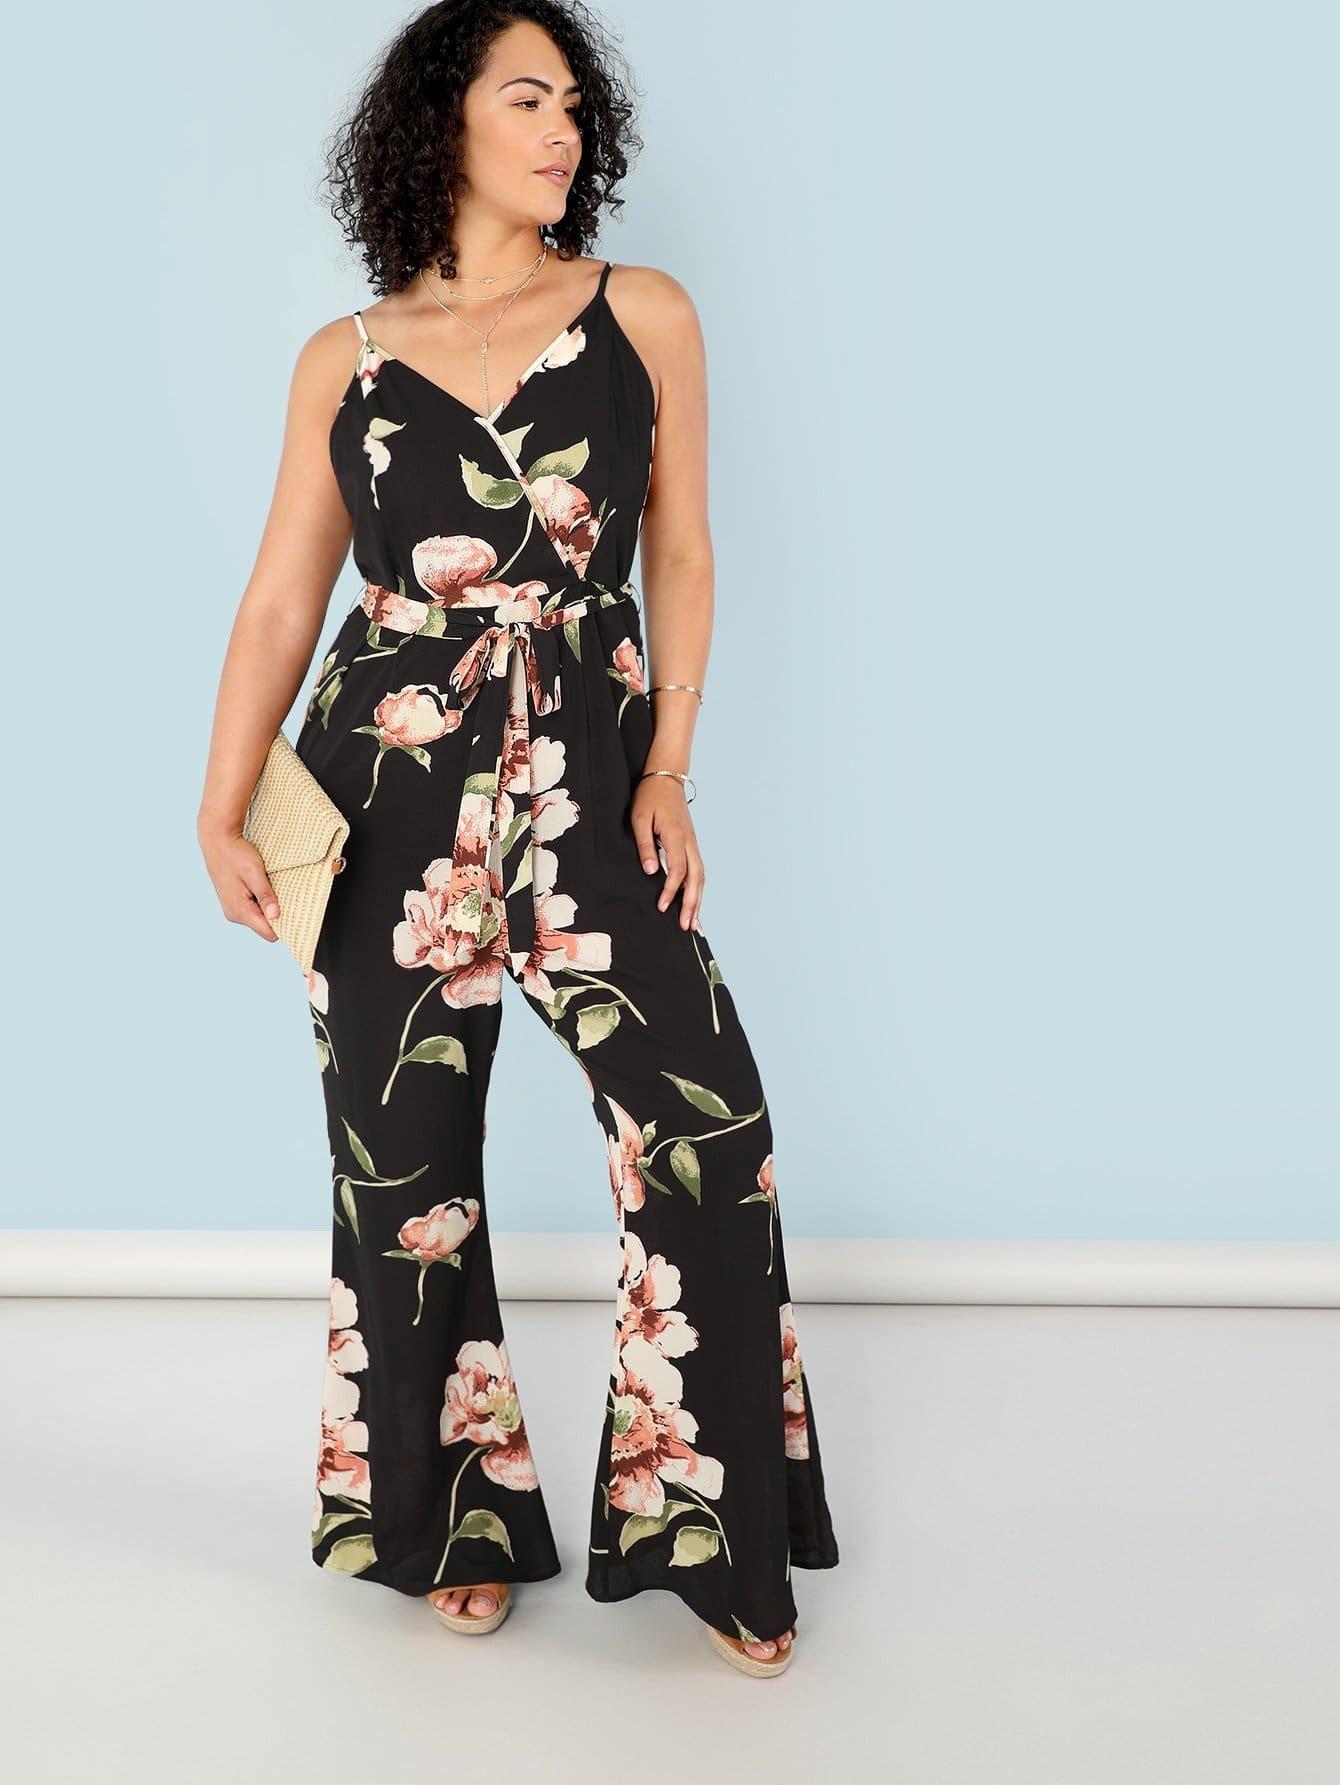 Floral Print Flare Leg Surplice Wrap Cami Jumpsuit halter surplice floral print jumpsuit